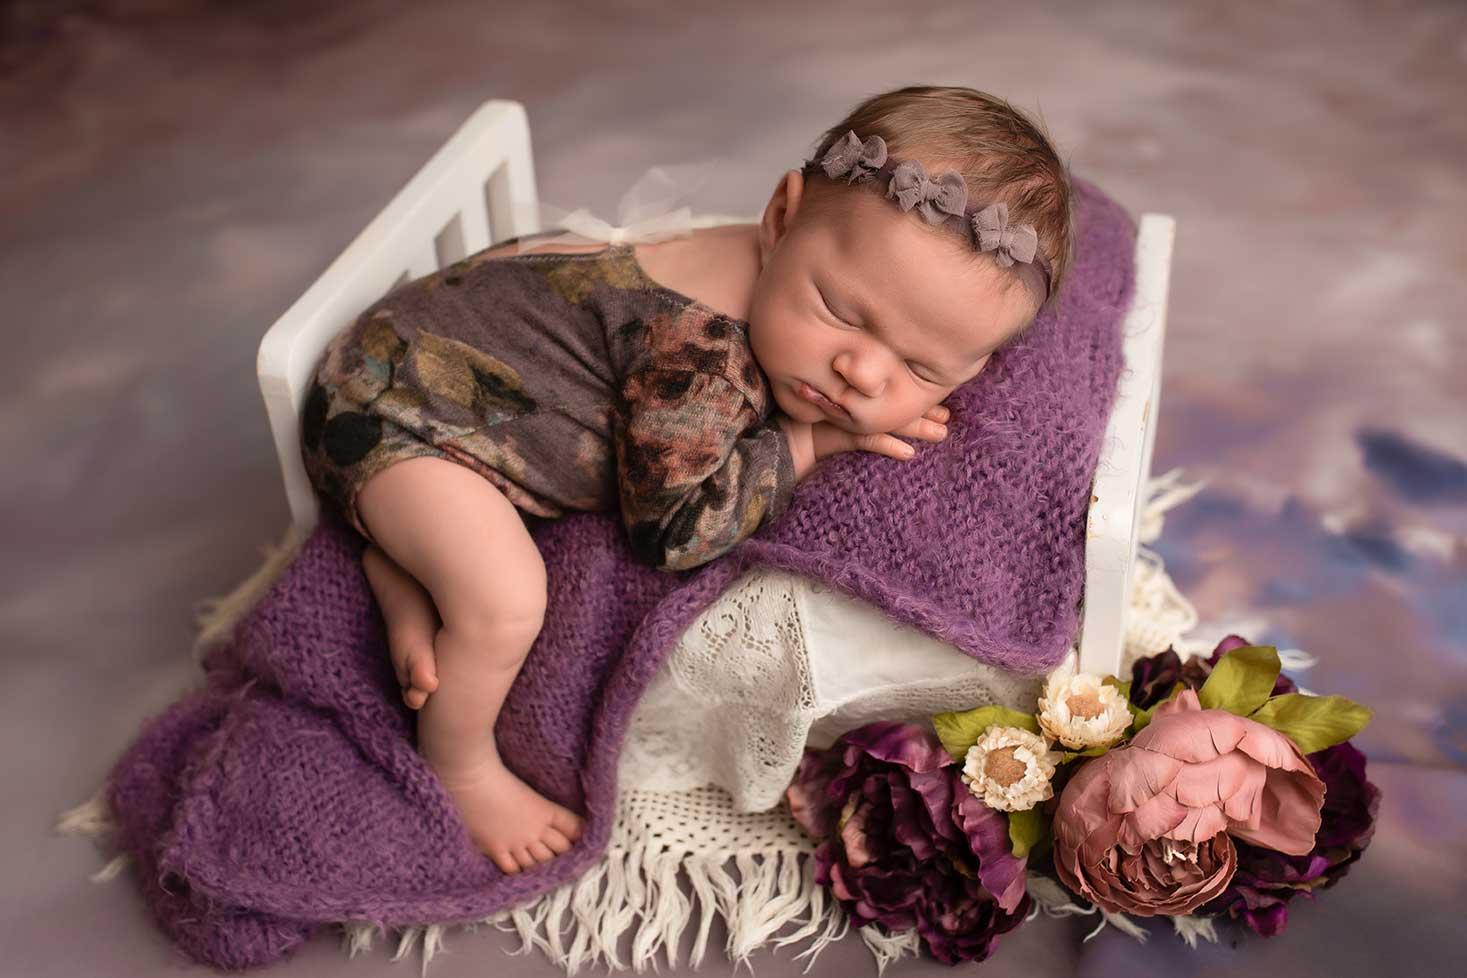 Newborn-photography-studio-goodyear-az